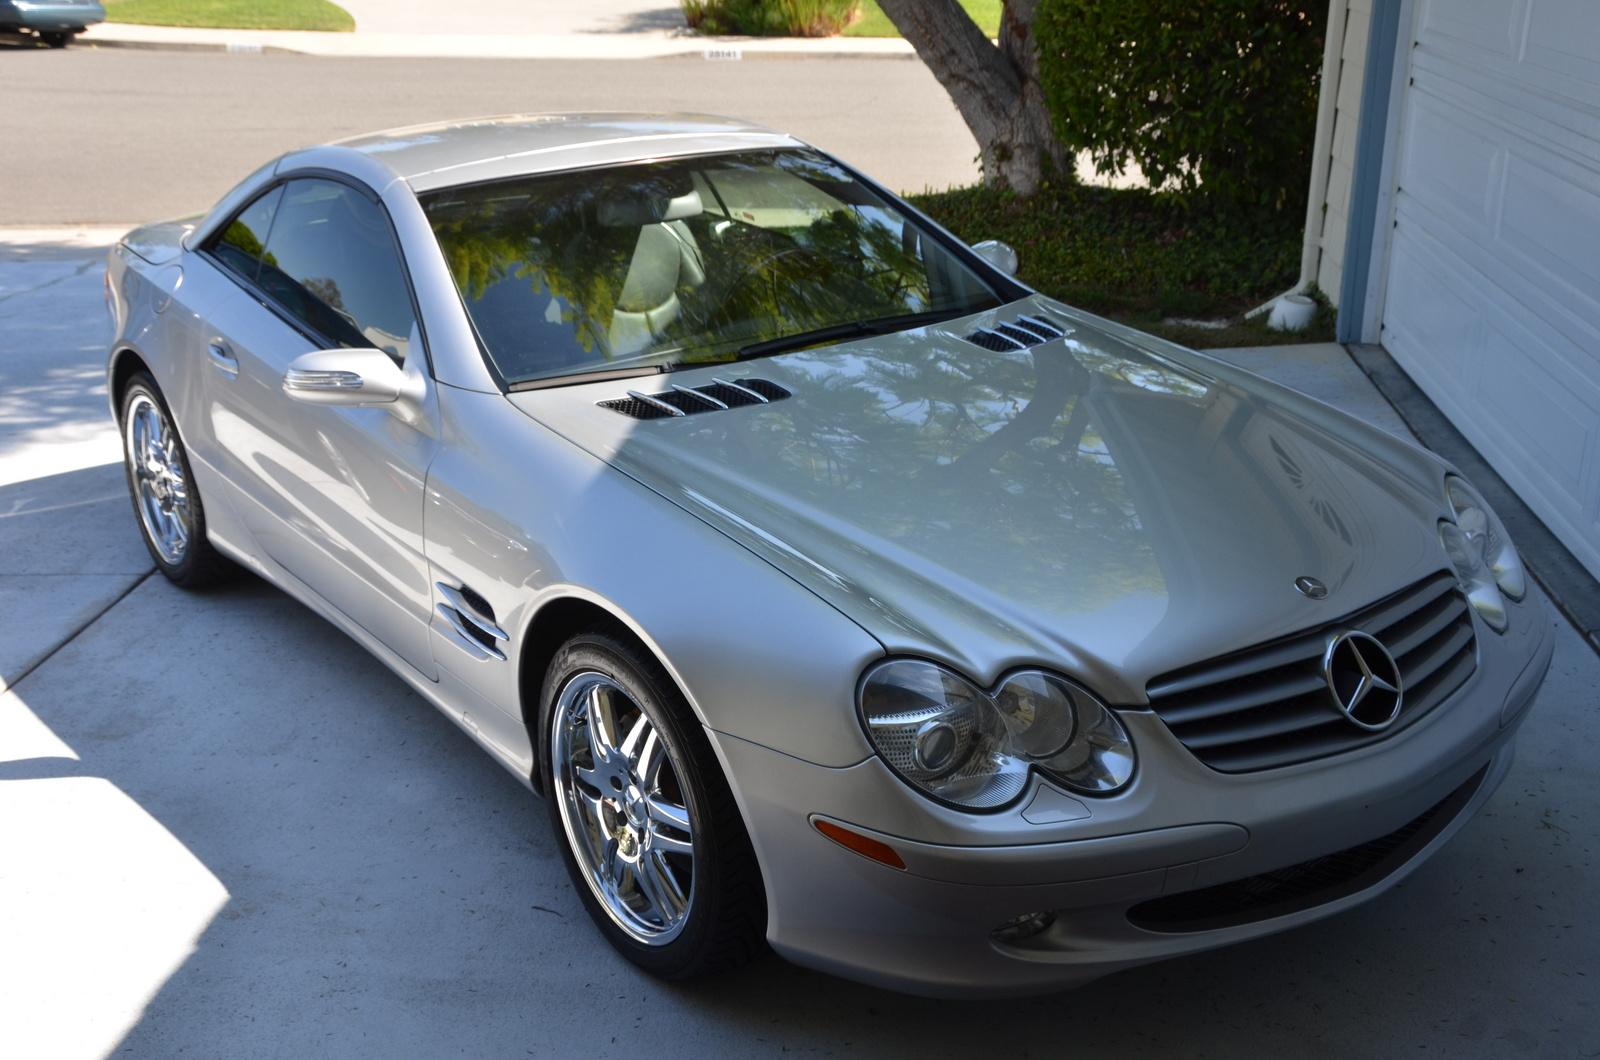 Mercedes benz vin check online autos post for Mercedes benz vin lookup